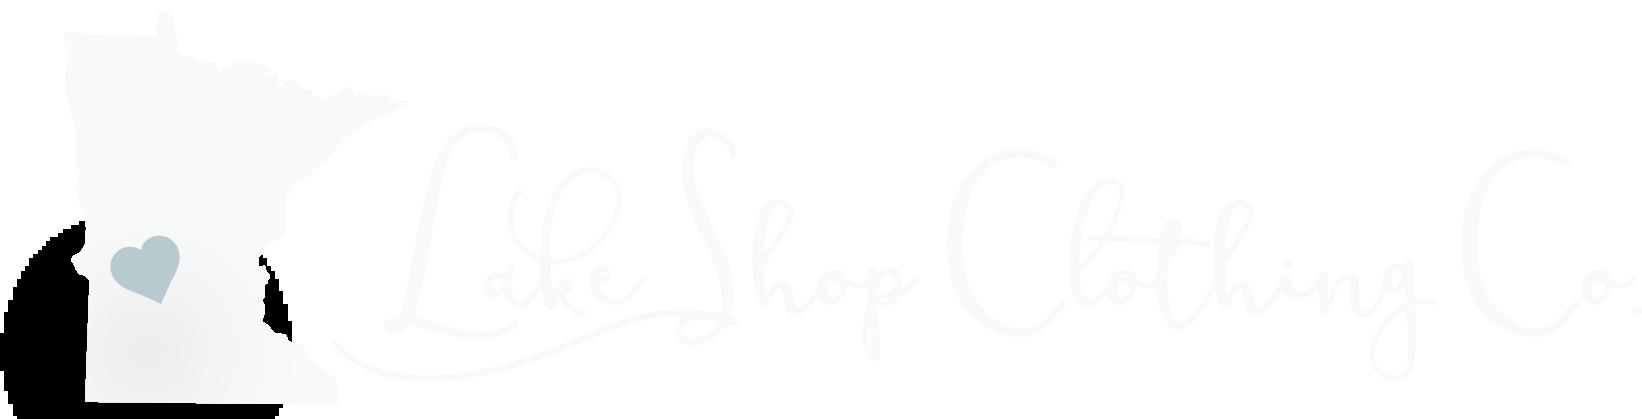 Minnesota Lake Shop Clothing Co.